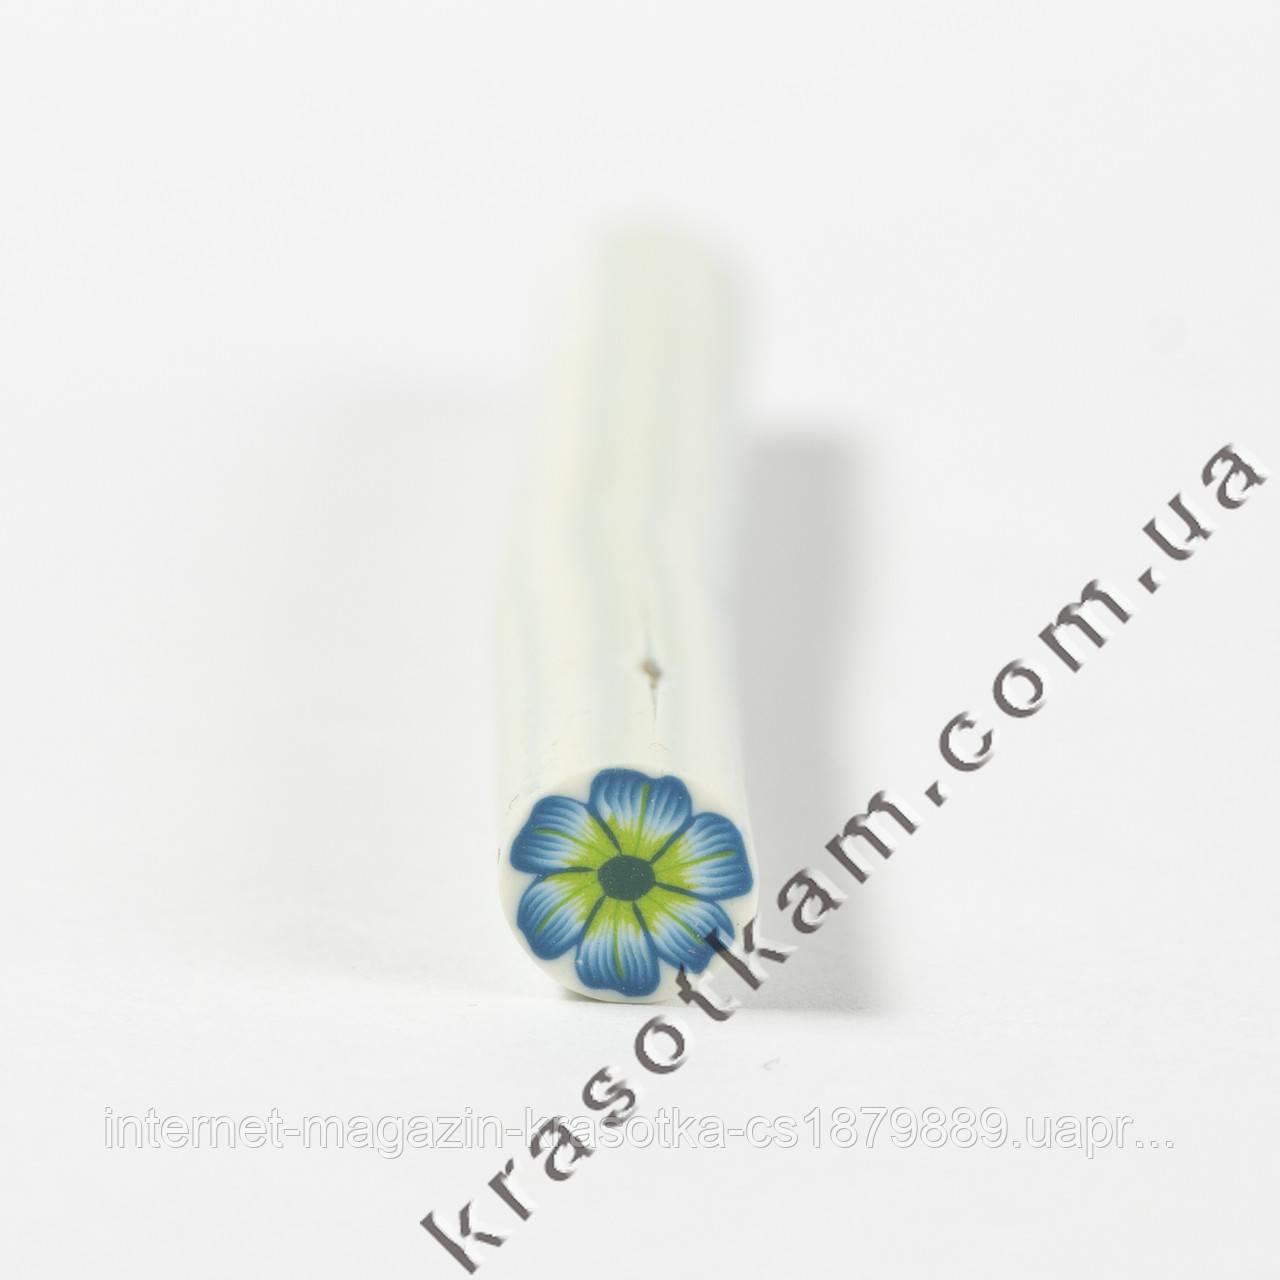 Фимо цветок сине-зелёный штанга